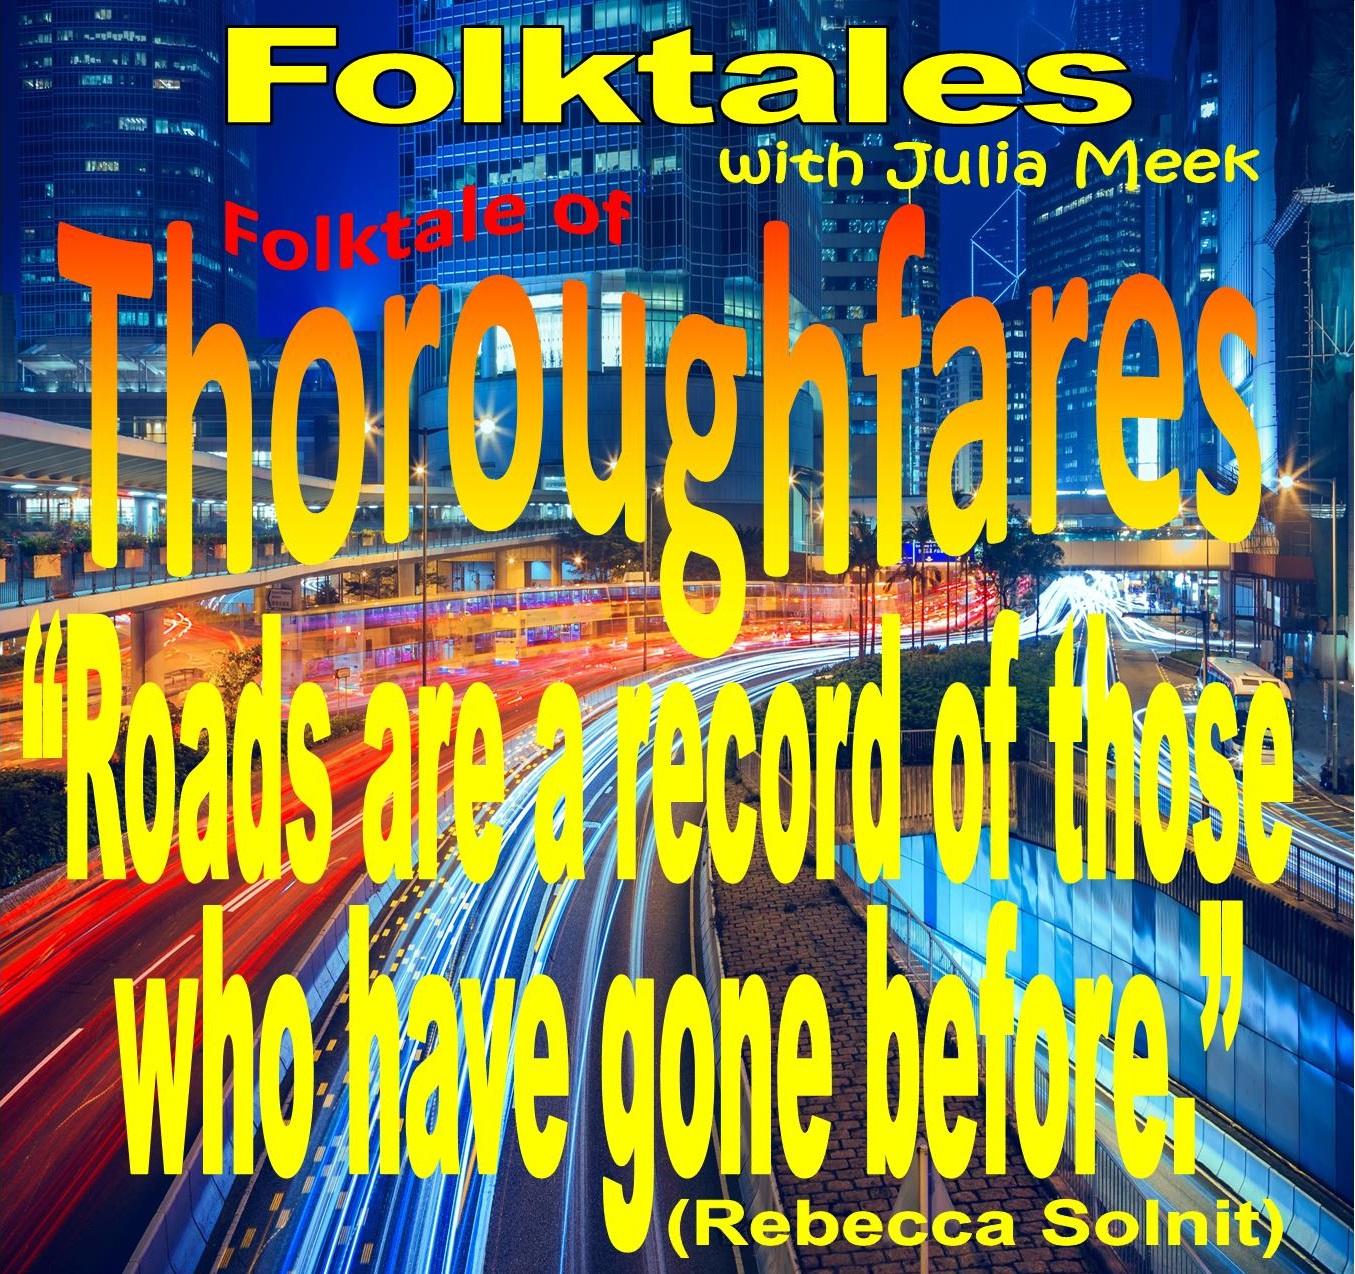 Caption: WBOI's Folktale of Thoroughfares, Credit: Julia Meek